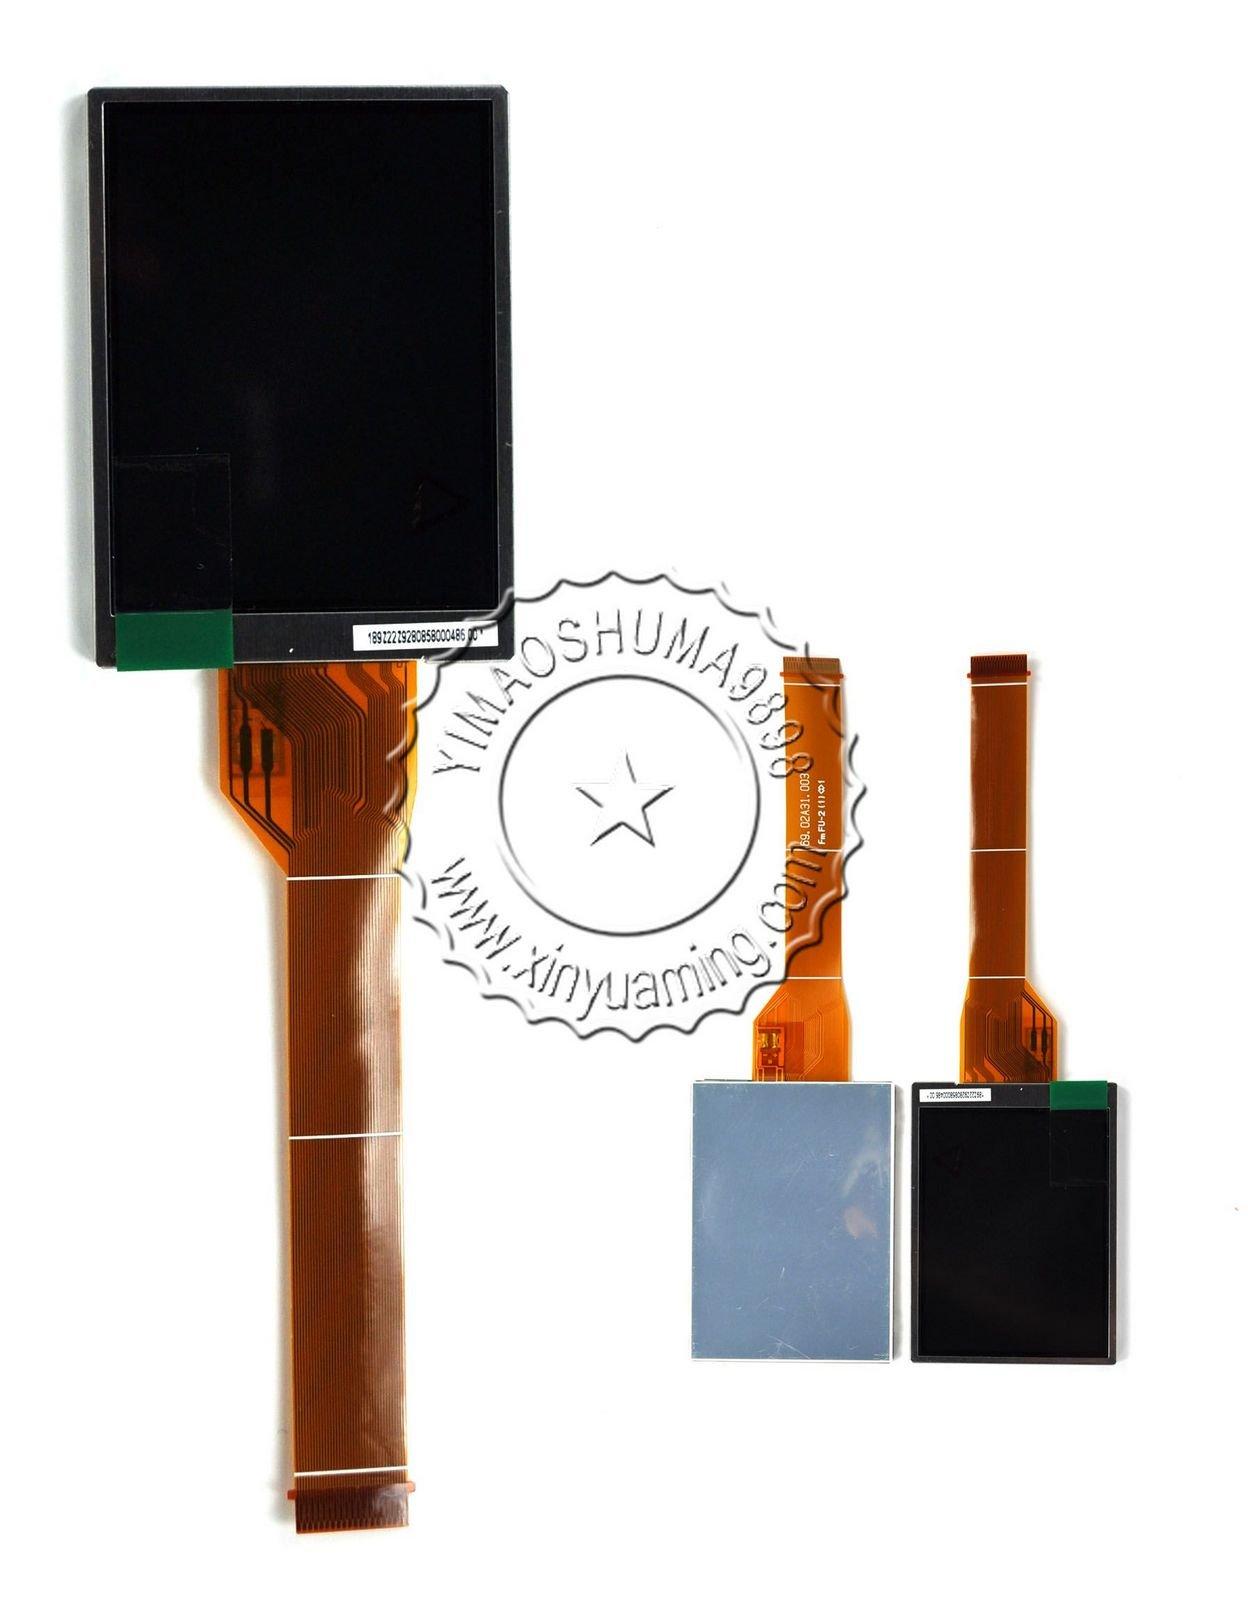 ЖК-модуль Fuji J10 J12 J15 LCD FUJI LCD J10 J12 J15 merida chica j12 2016